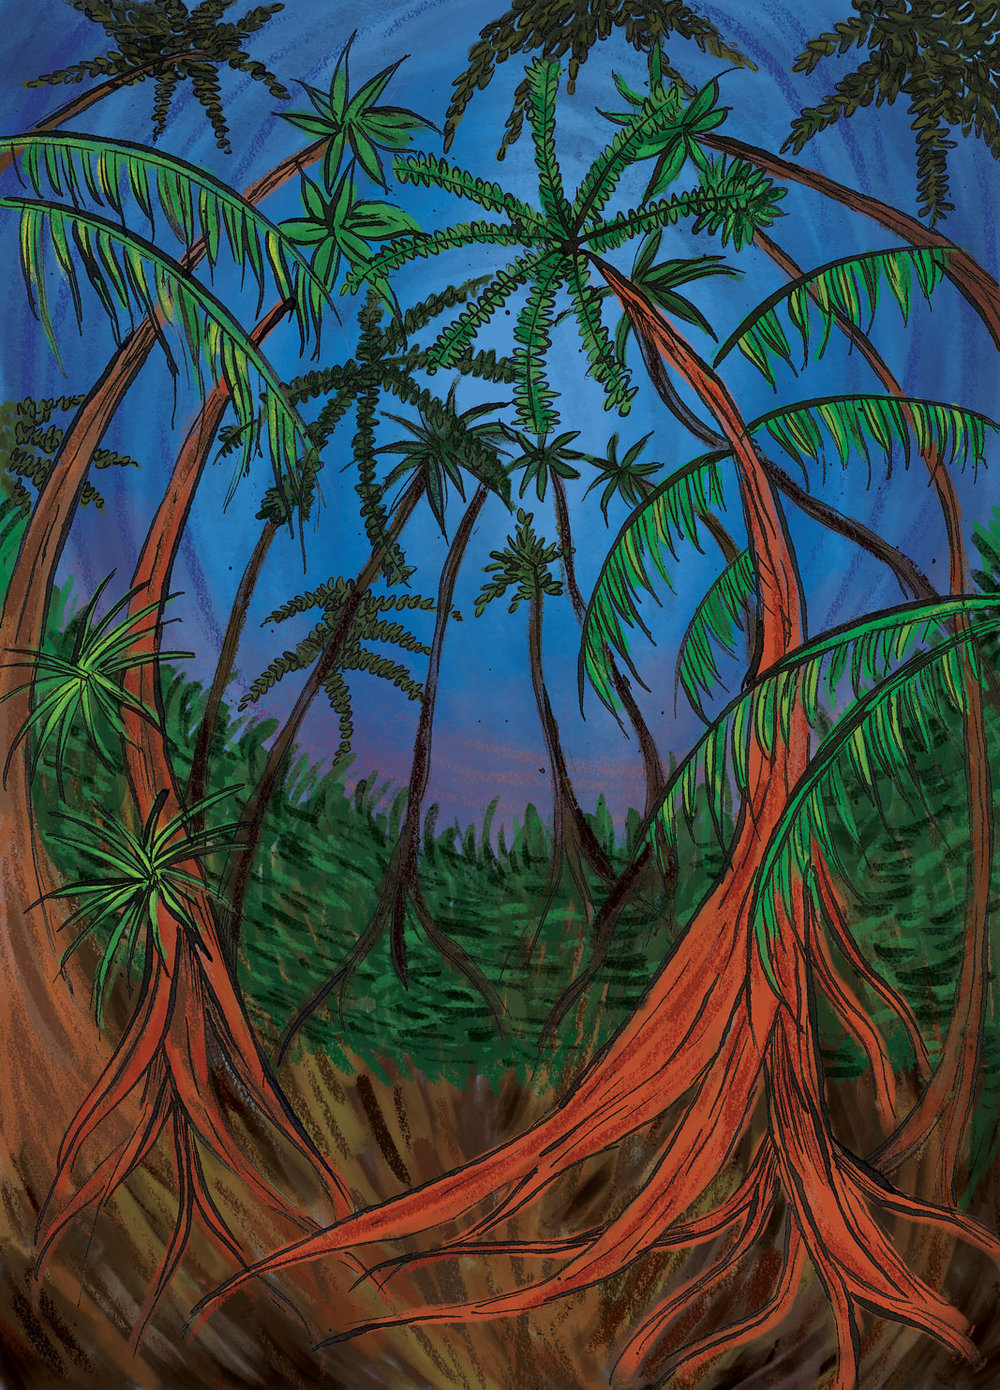 Illustration for    Animus  magazine